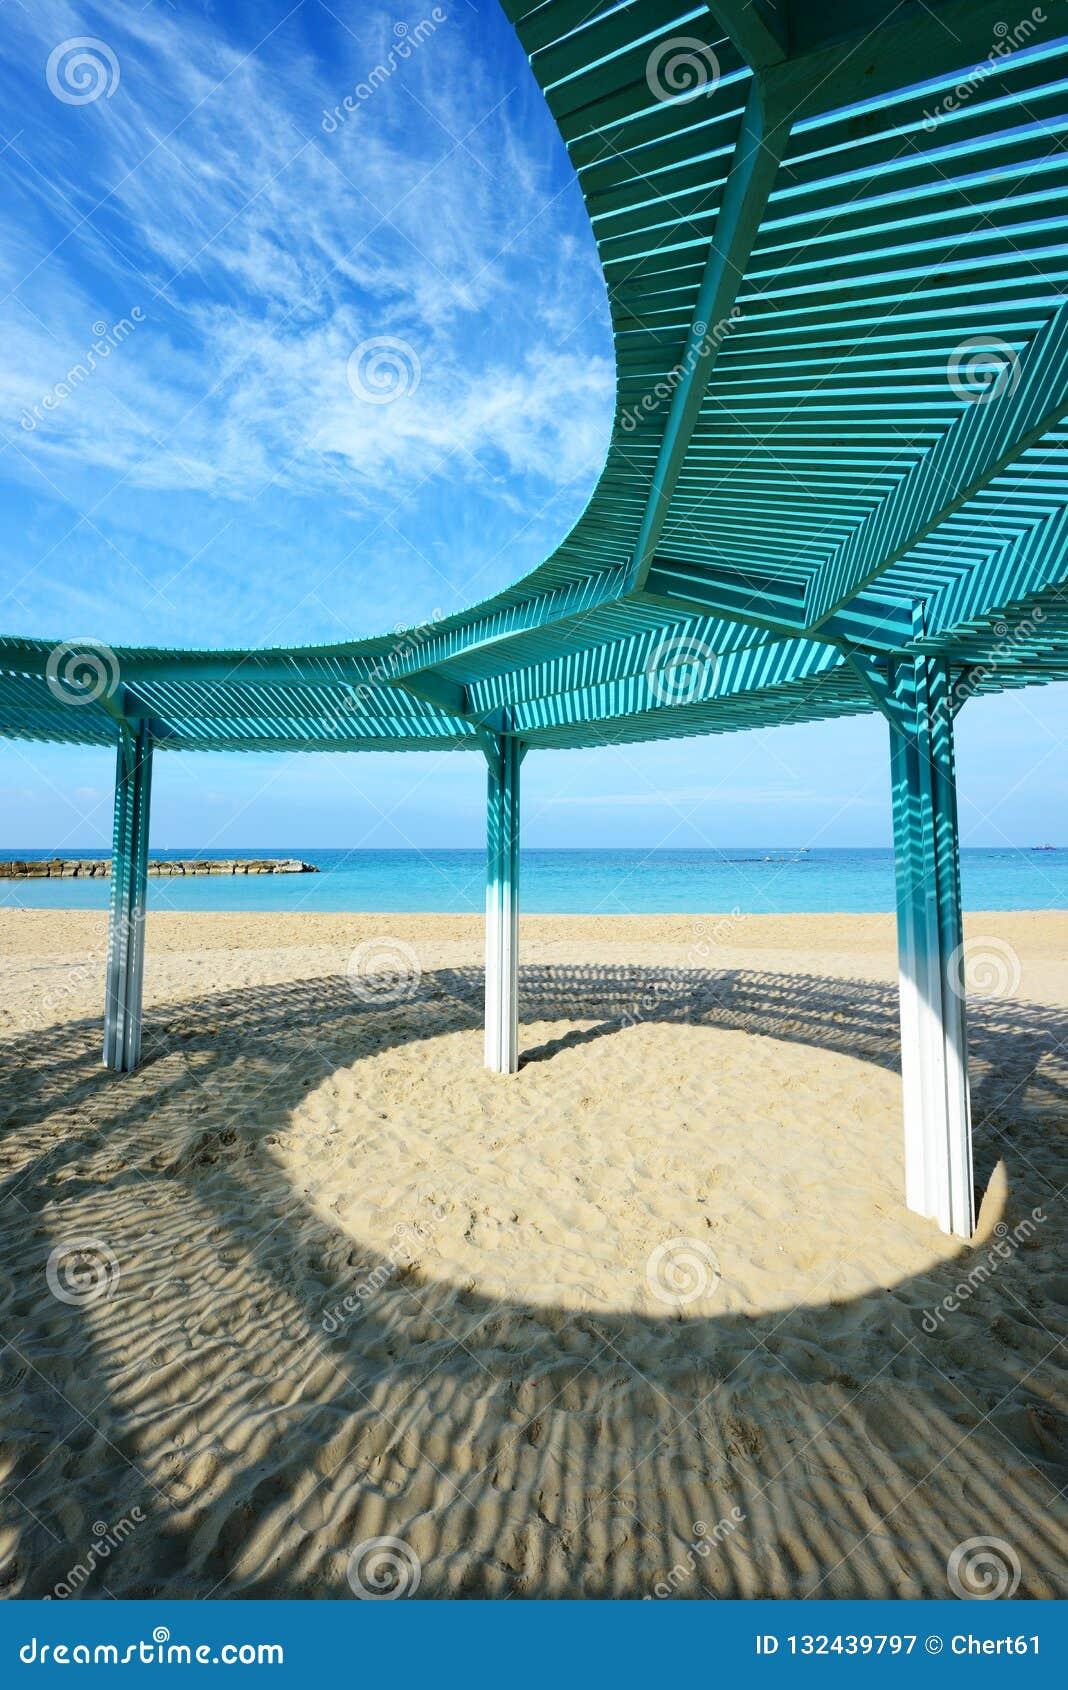 Solar Canopy On The Beach Of Mediterranean Sea Stock Image